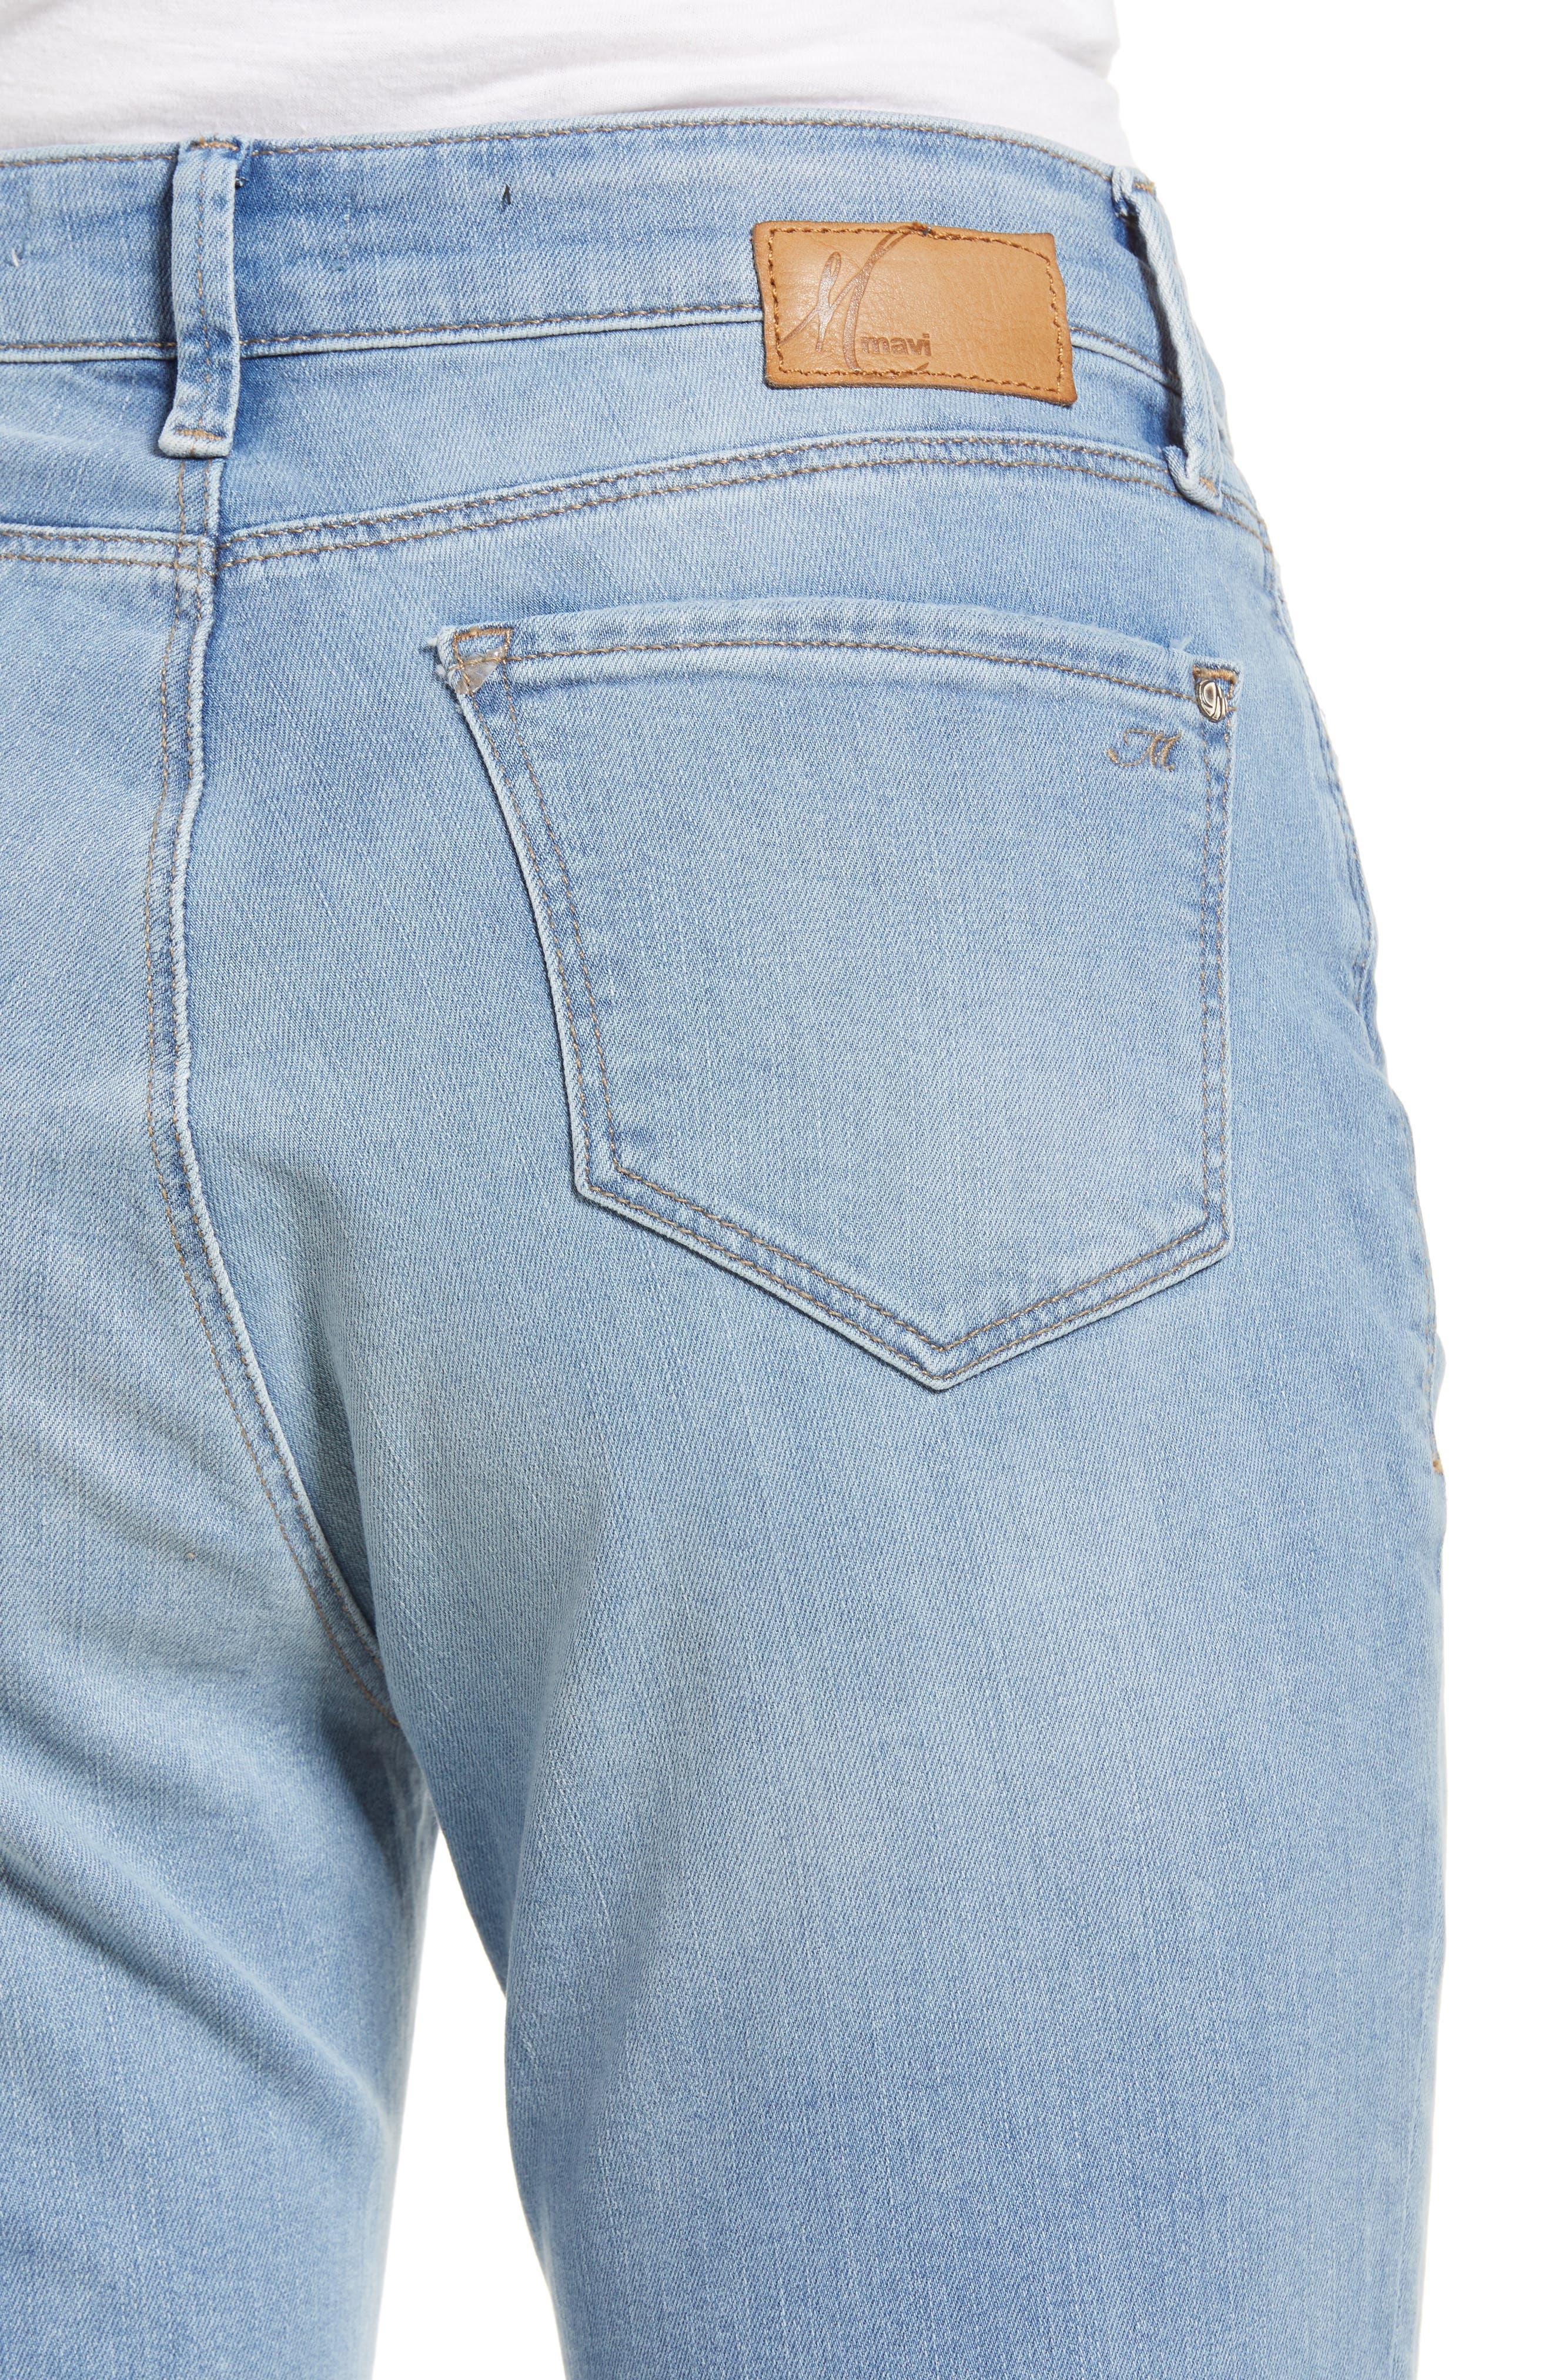 Lea Boyfriend Ripped Jeans,                             Alternate thumbnail 4, color,                             Light Ripped Vintage